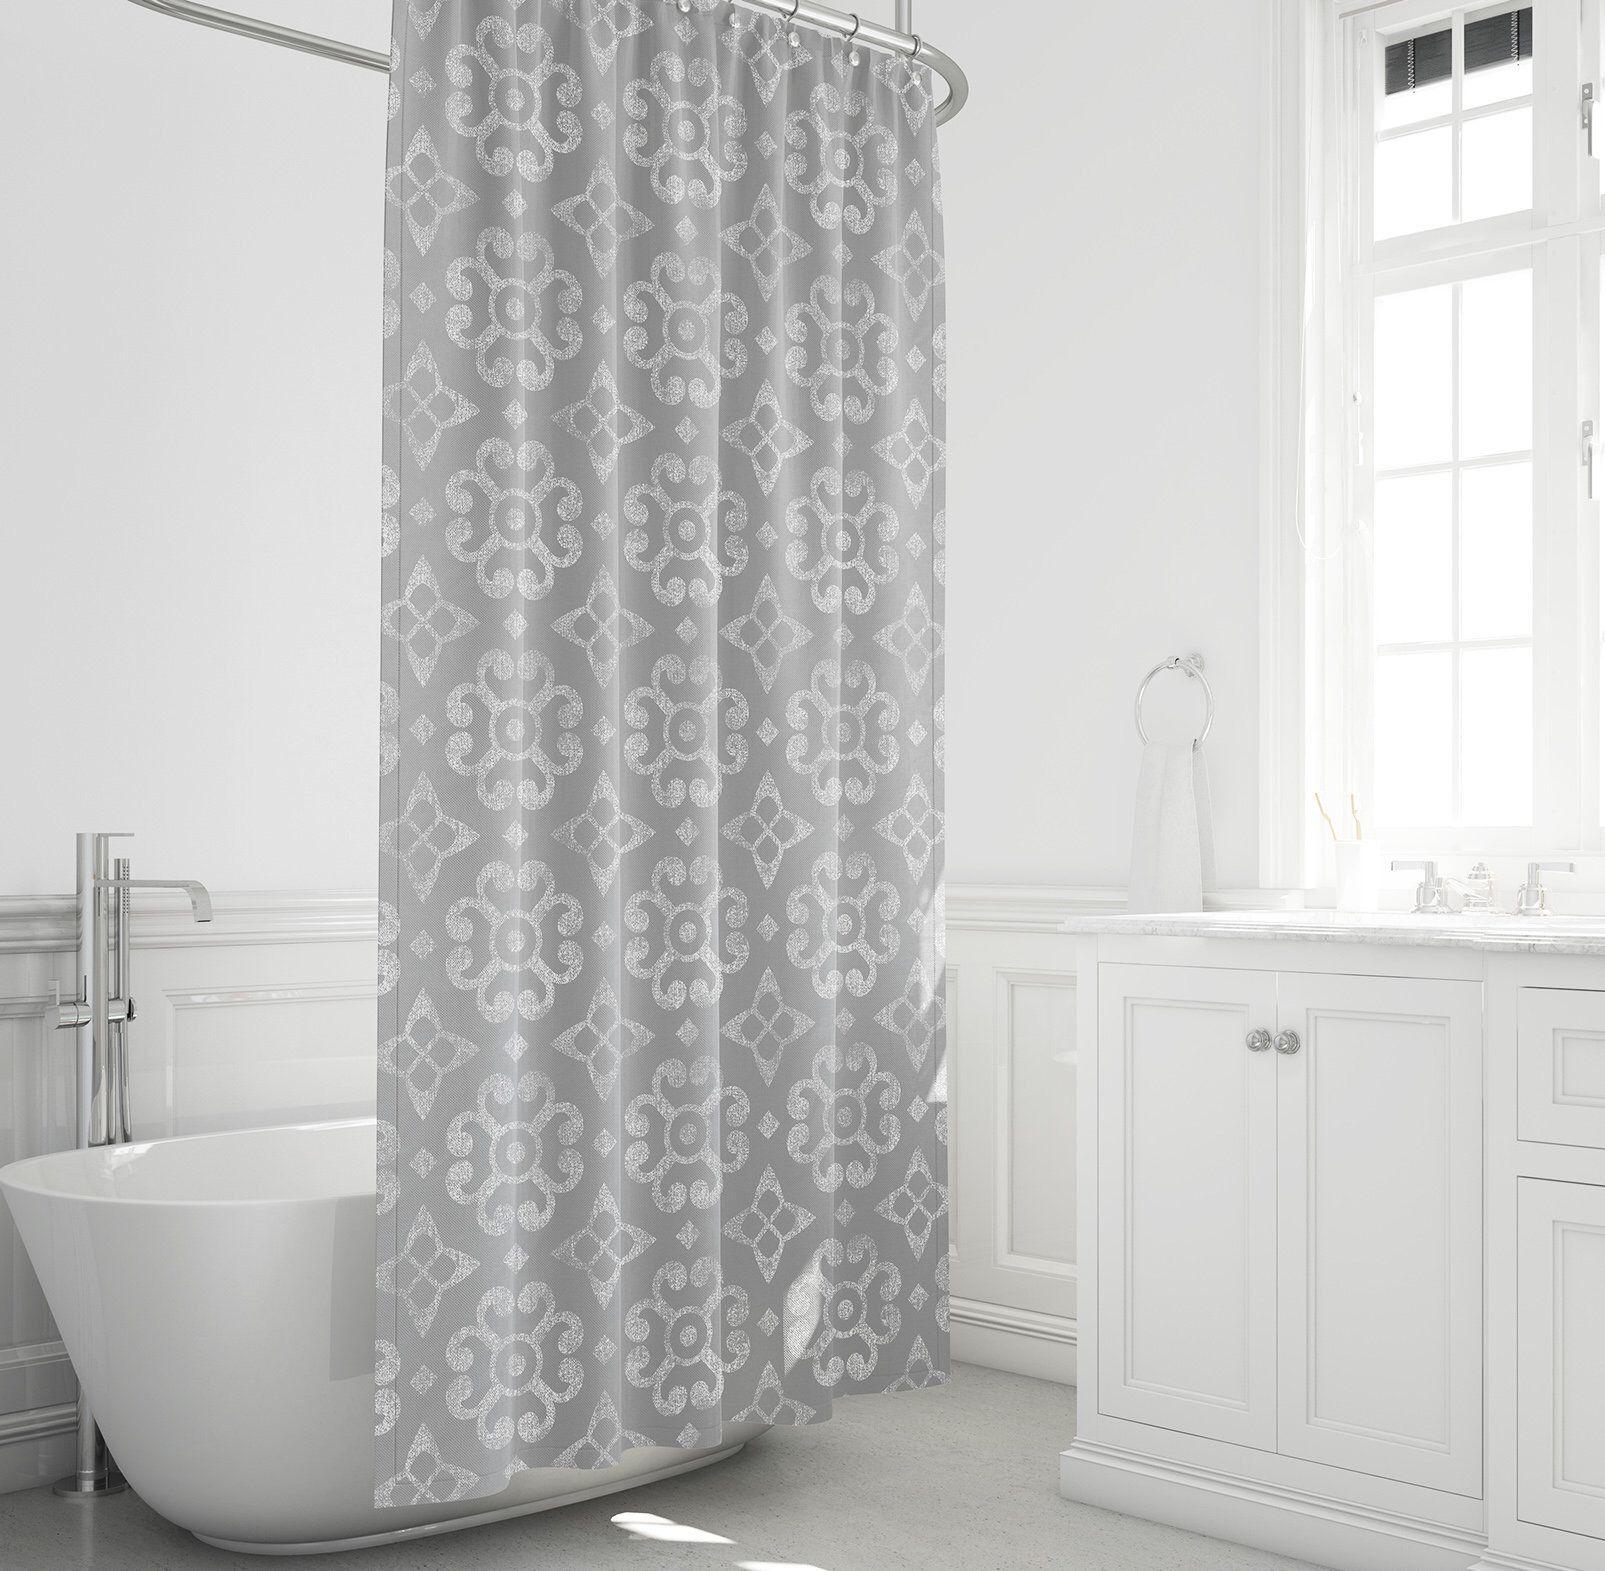 Farmhouse shower curtain gray and white bathroom decor